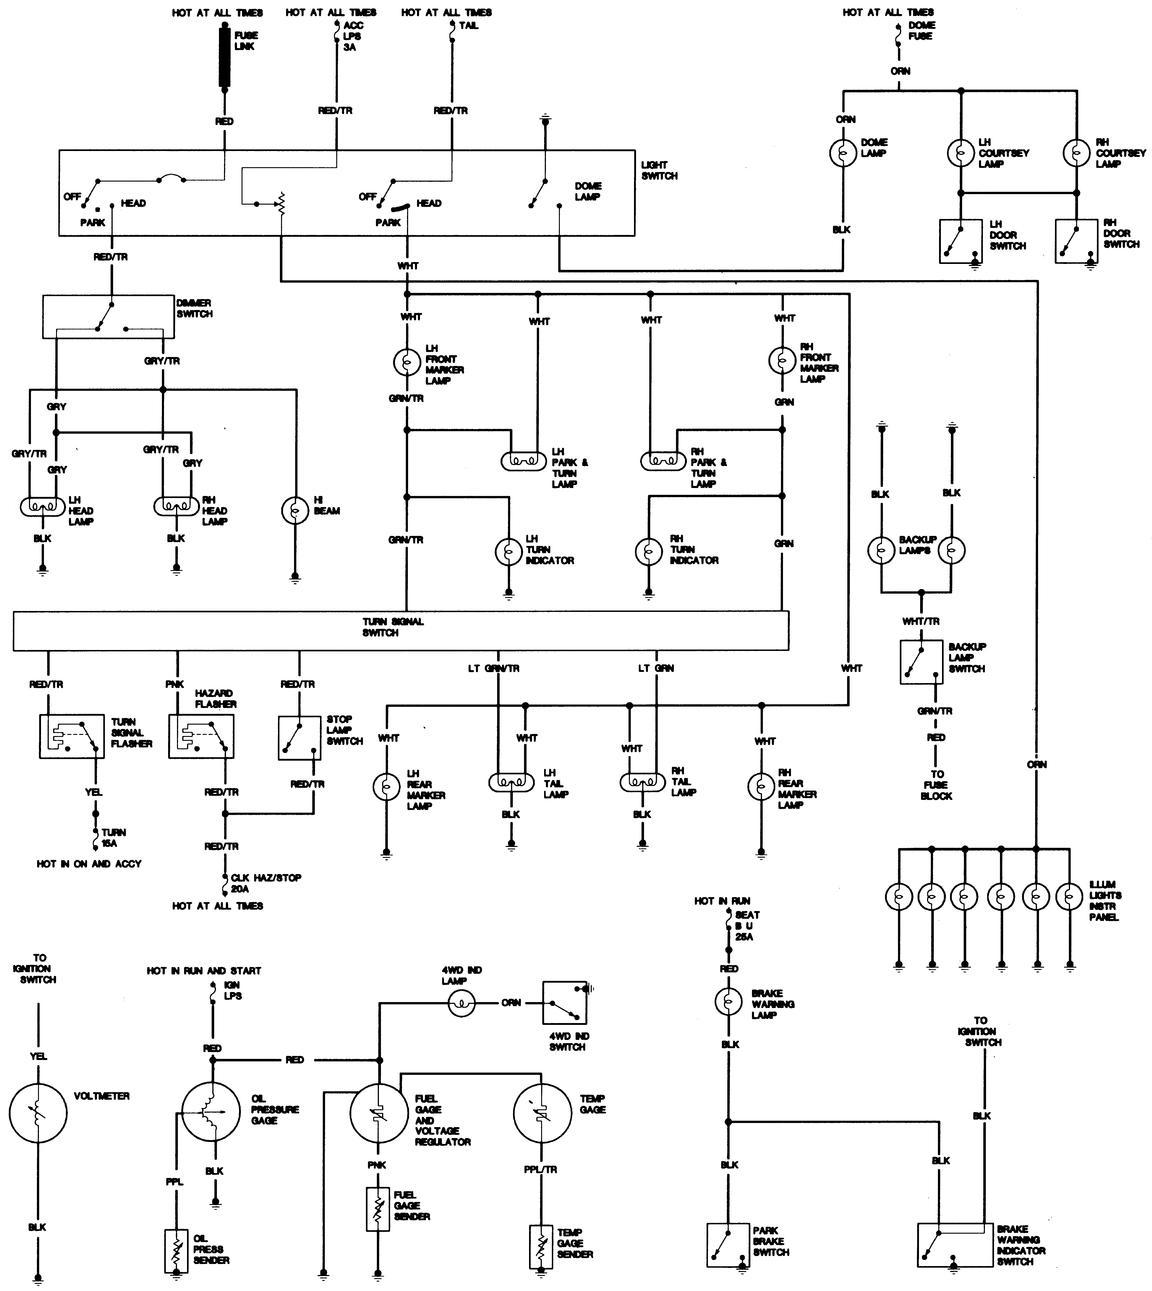 [DIAGRAM_38YU]  CT_3339] 1973 Jeep Cj5 Wiring Diagram Moreover 1975 Jeep Cj5 Wiring Diagram  Free Diagram | Wiring Diagram For 78 Cj5 Jeep |  | Unec Cette Mohammedshrine Librar Wiring 101